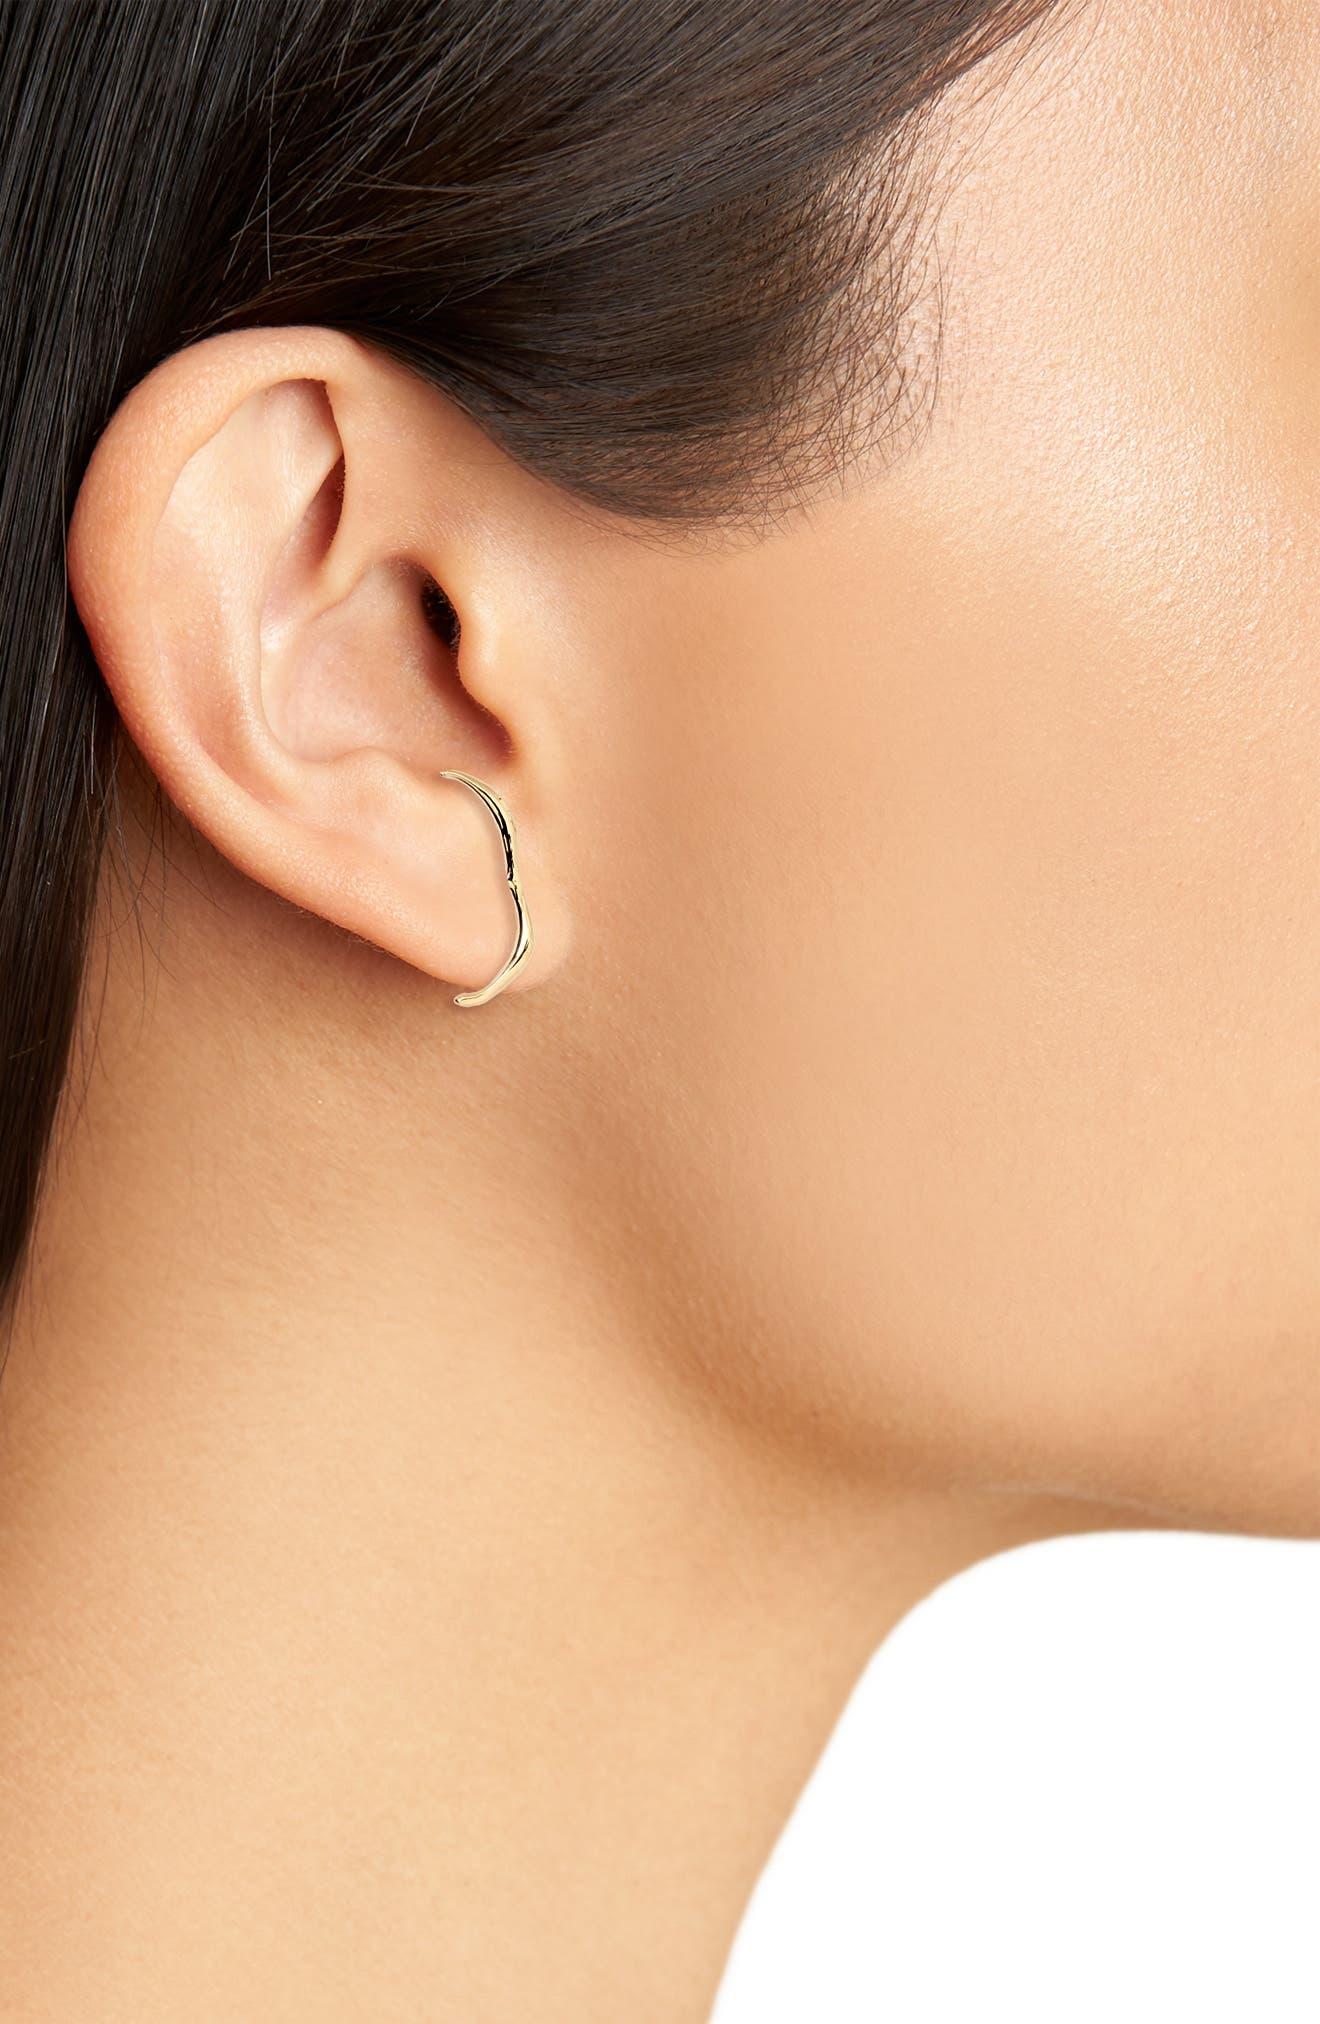 Vero Stud Earrings,                             Alternate thumbnail 2, color,                             Gold